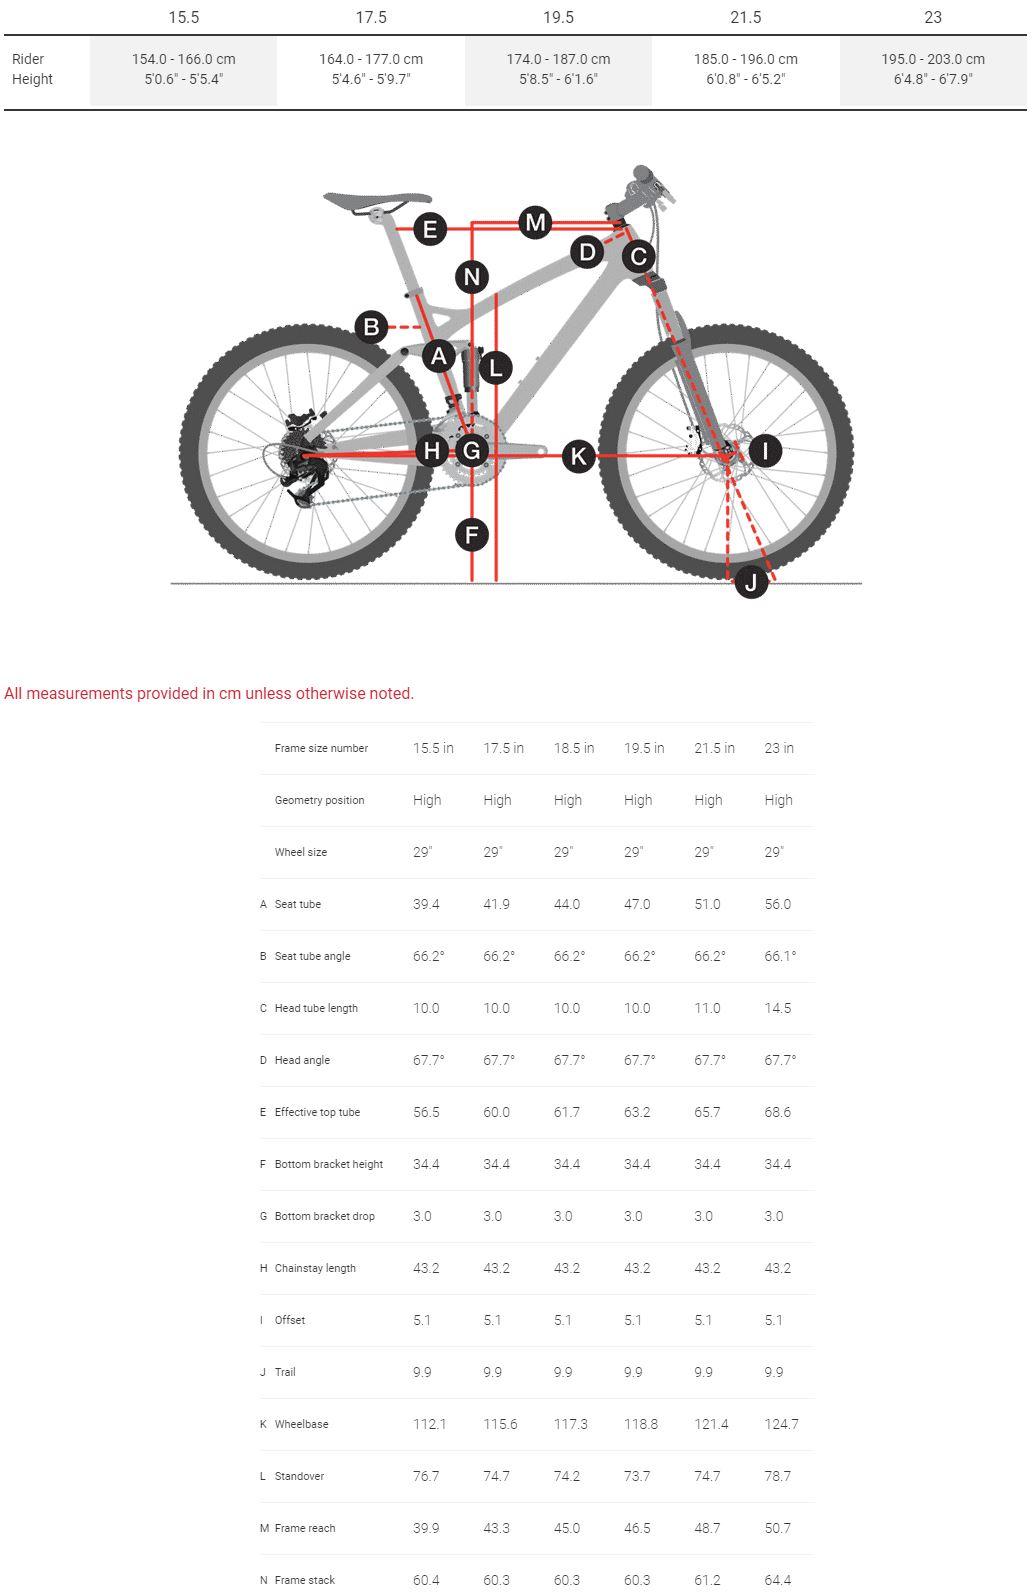 Trek Fuel EX Al Frameset Geometry